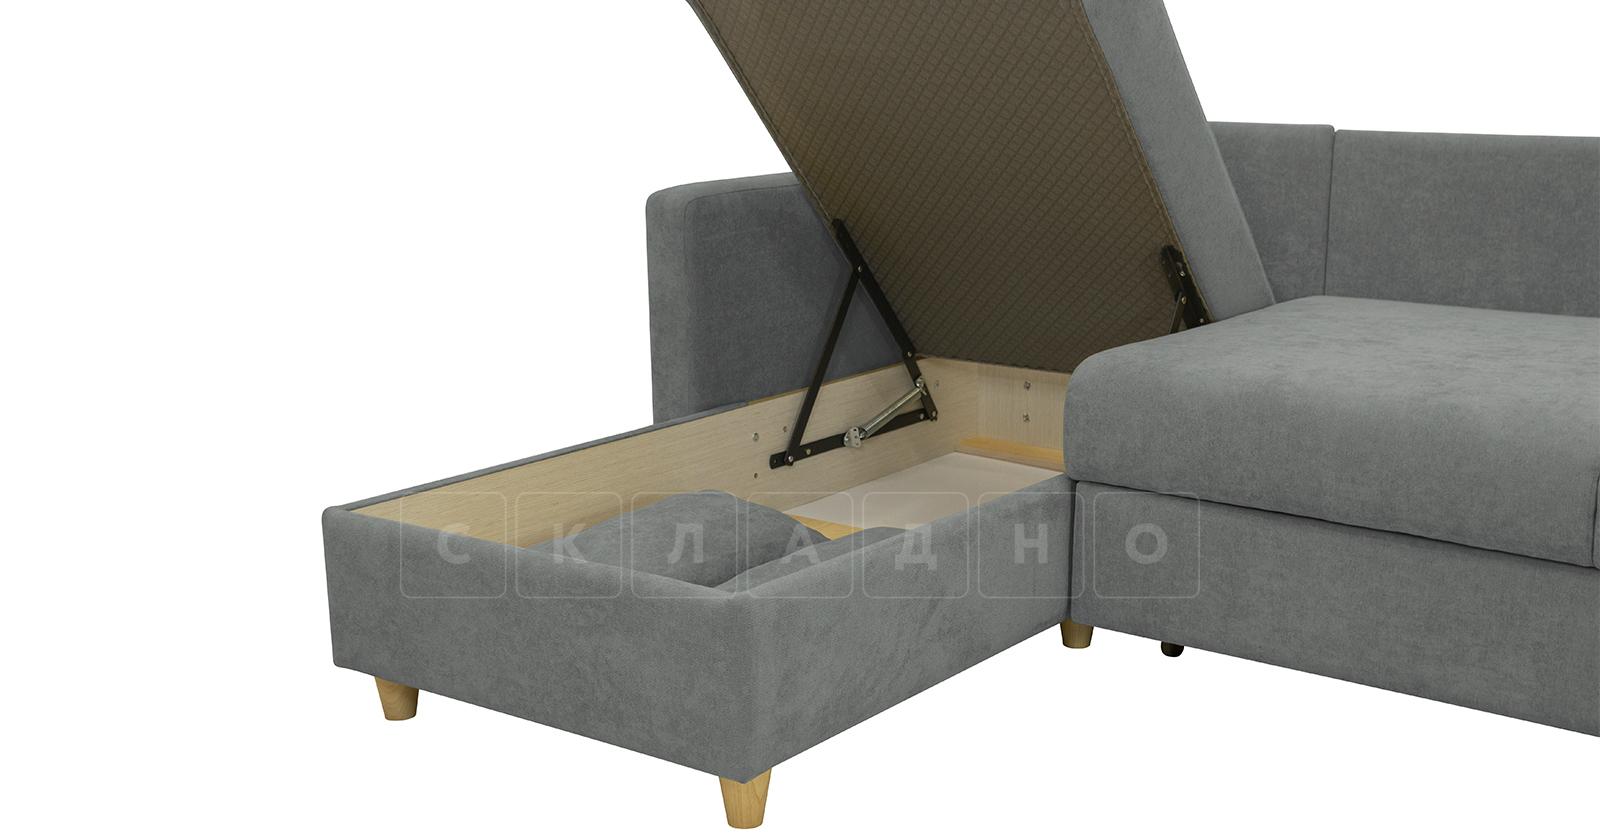 Угловой диван Дарвин серый фото 7 | интернет-магазин Складно